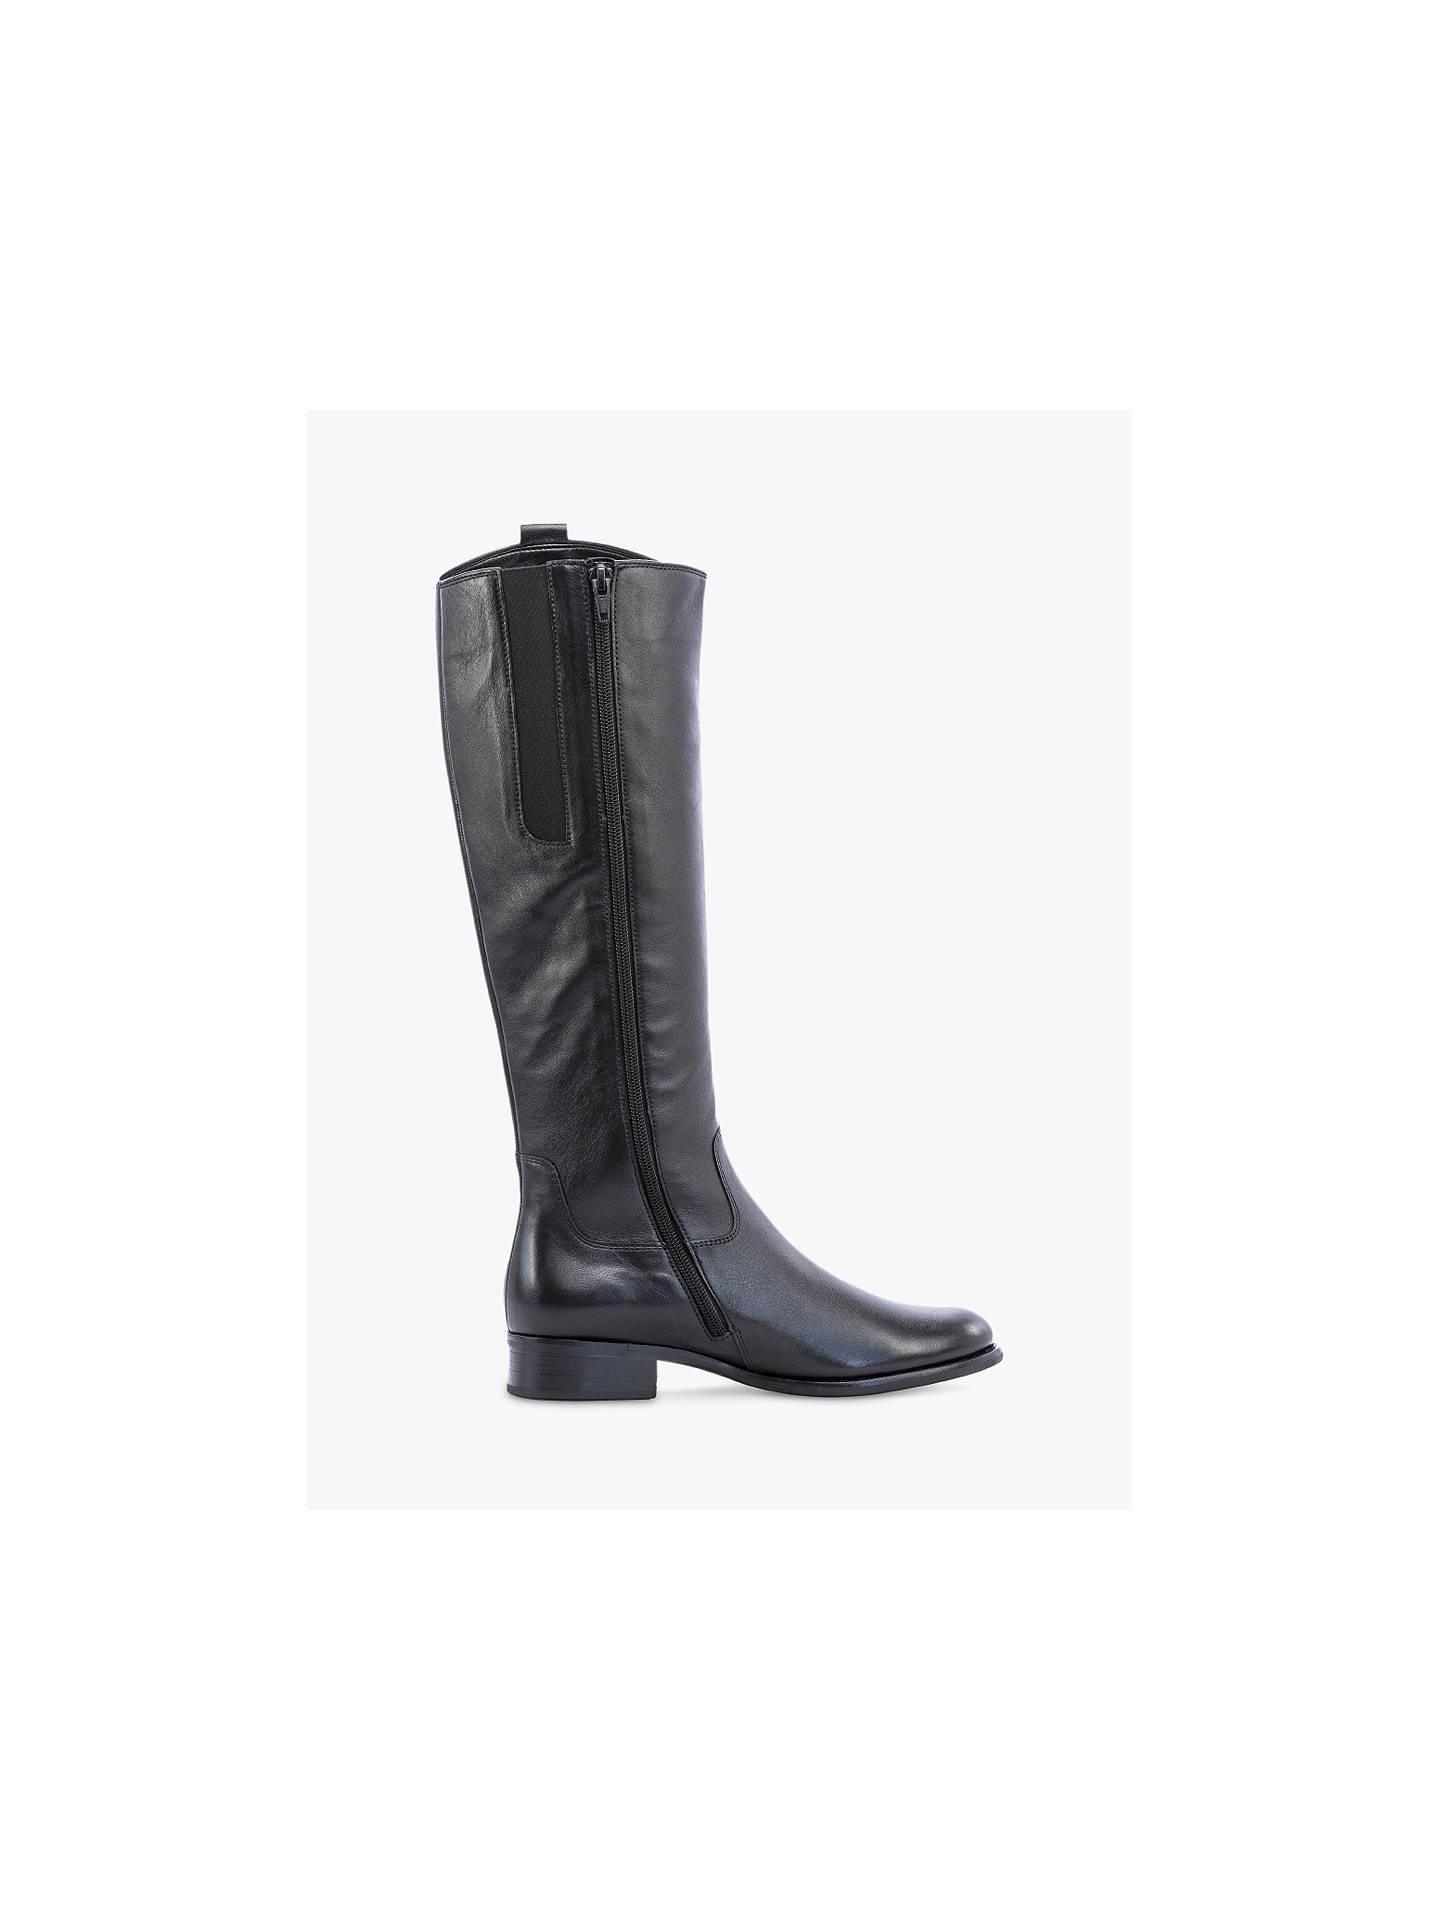 80242c4aca1 Buy Gabor Brook Long Slim Block Heel Boots